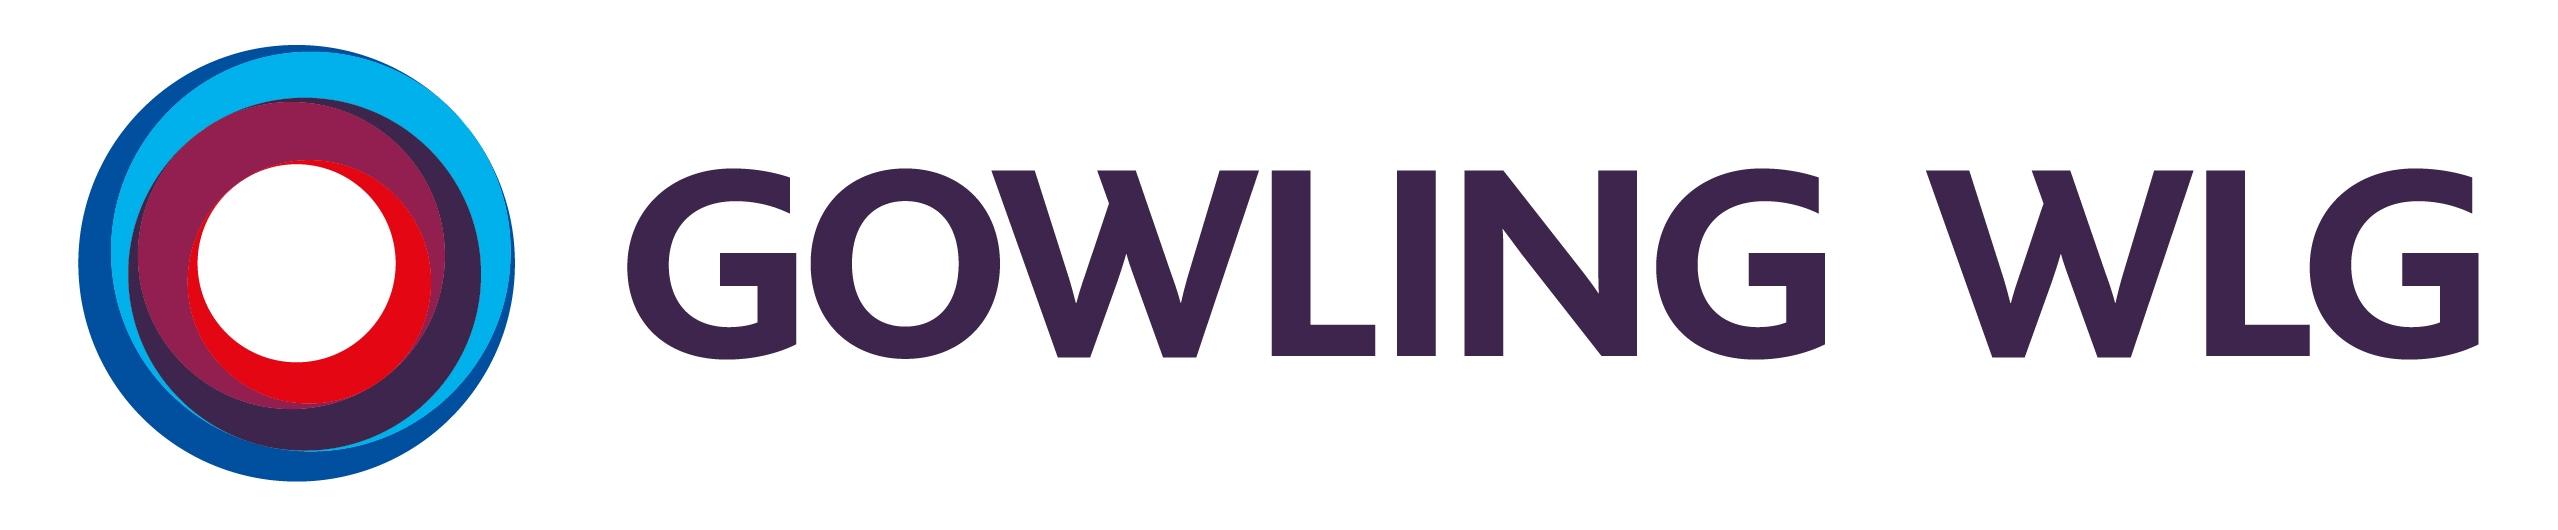 GowlingWLG_rgb_pos NEW